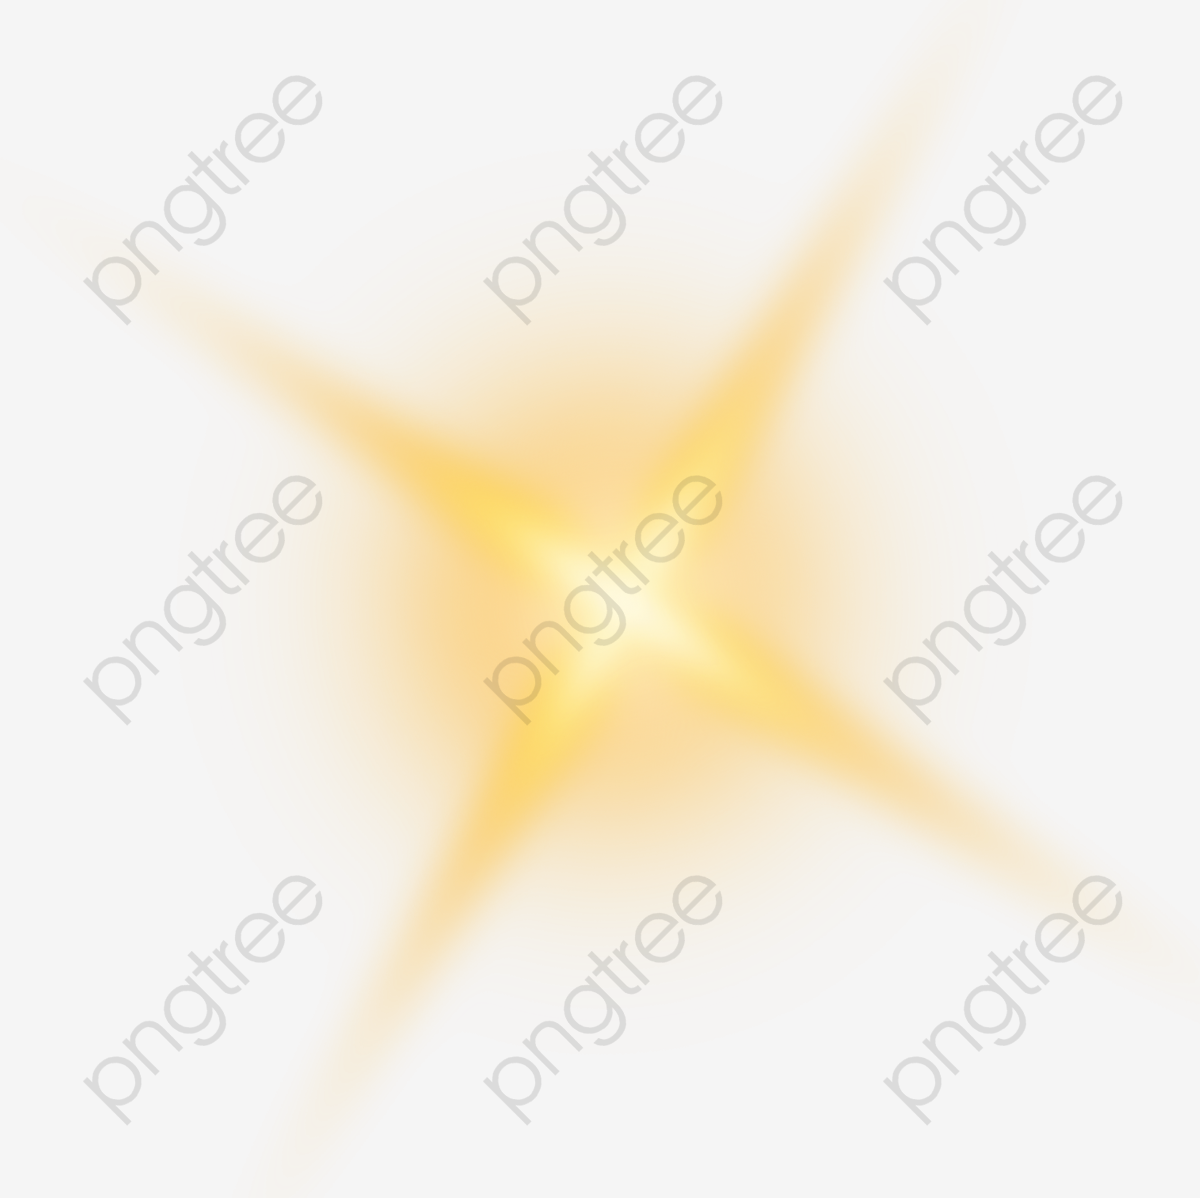 Golden Shine Light Effect Element, Shine, Light PNG Transparent.